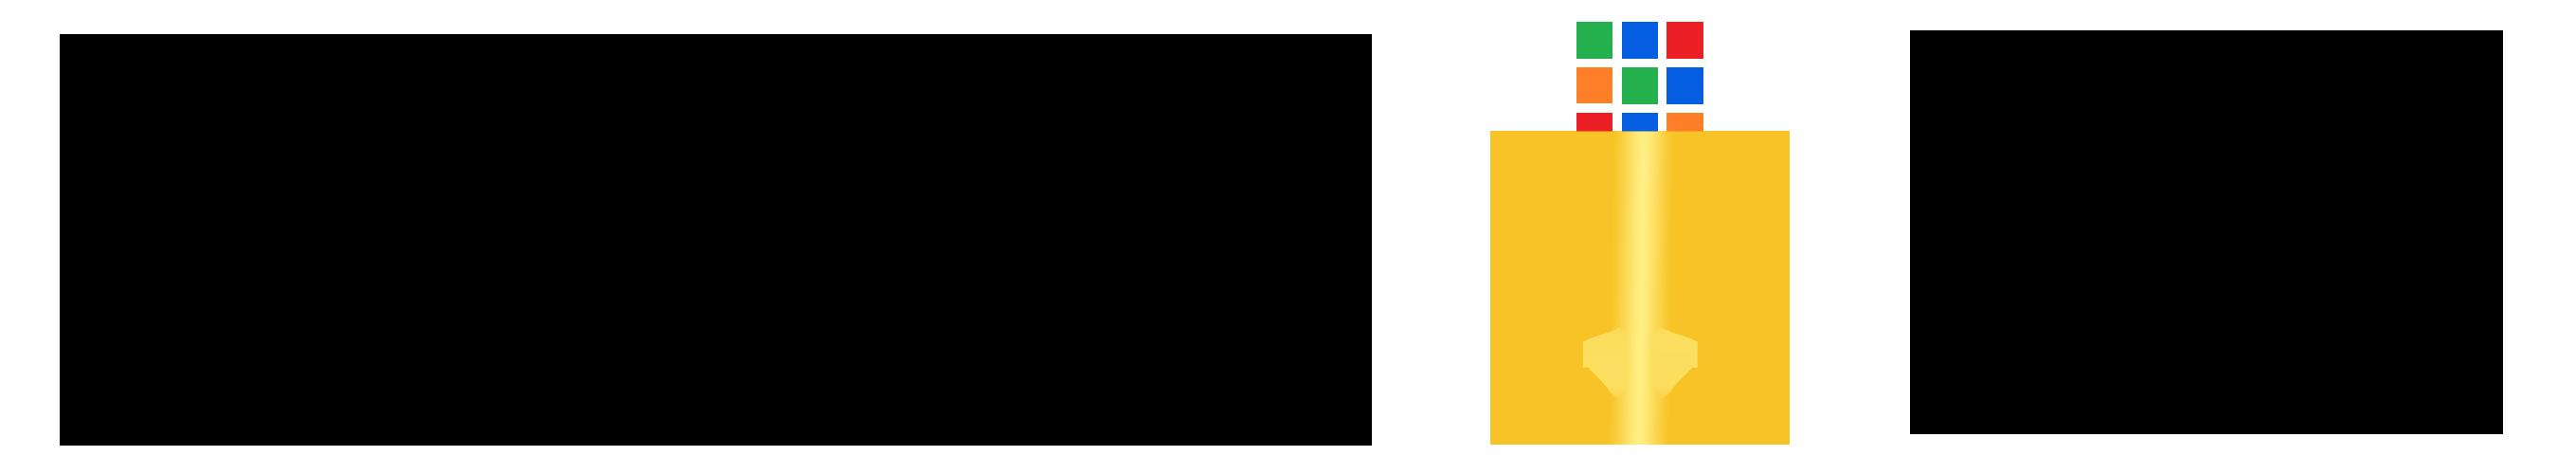 cubepb.com